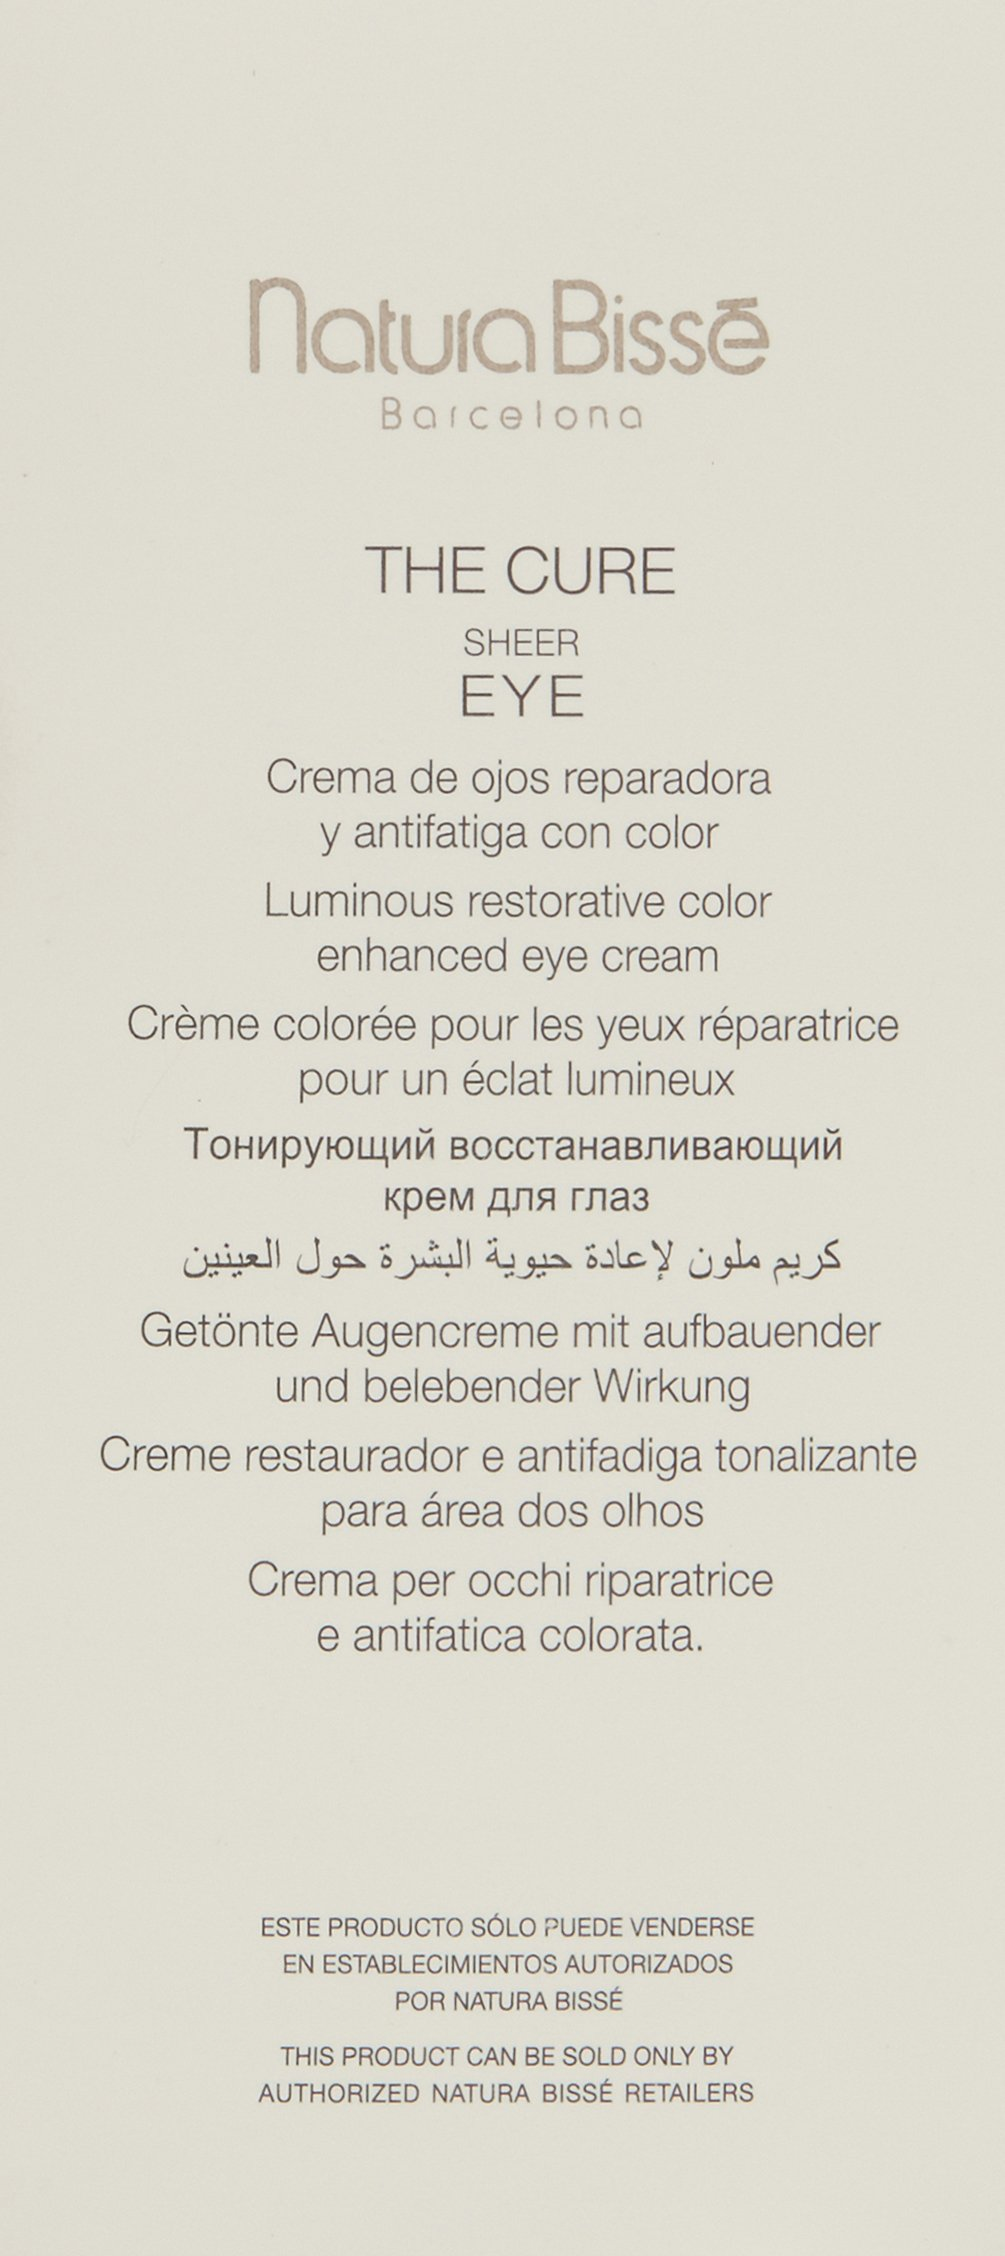 Natura Bisse The Cure Sheer Eye, 0.5 Oz by Natura Bisse (Image #3)